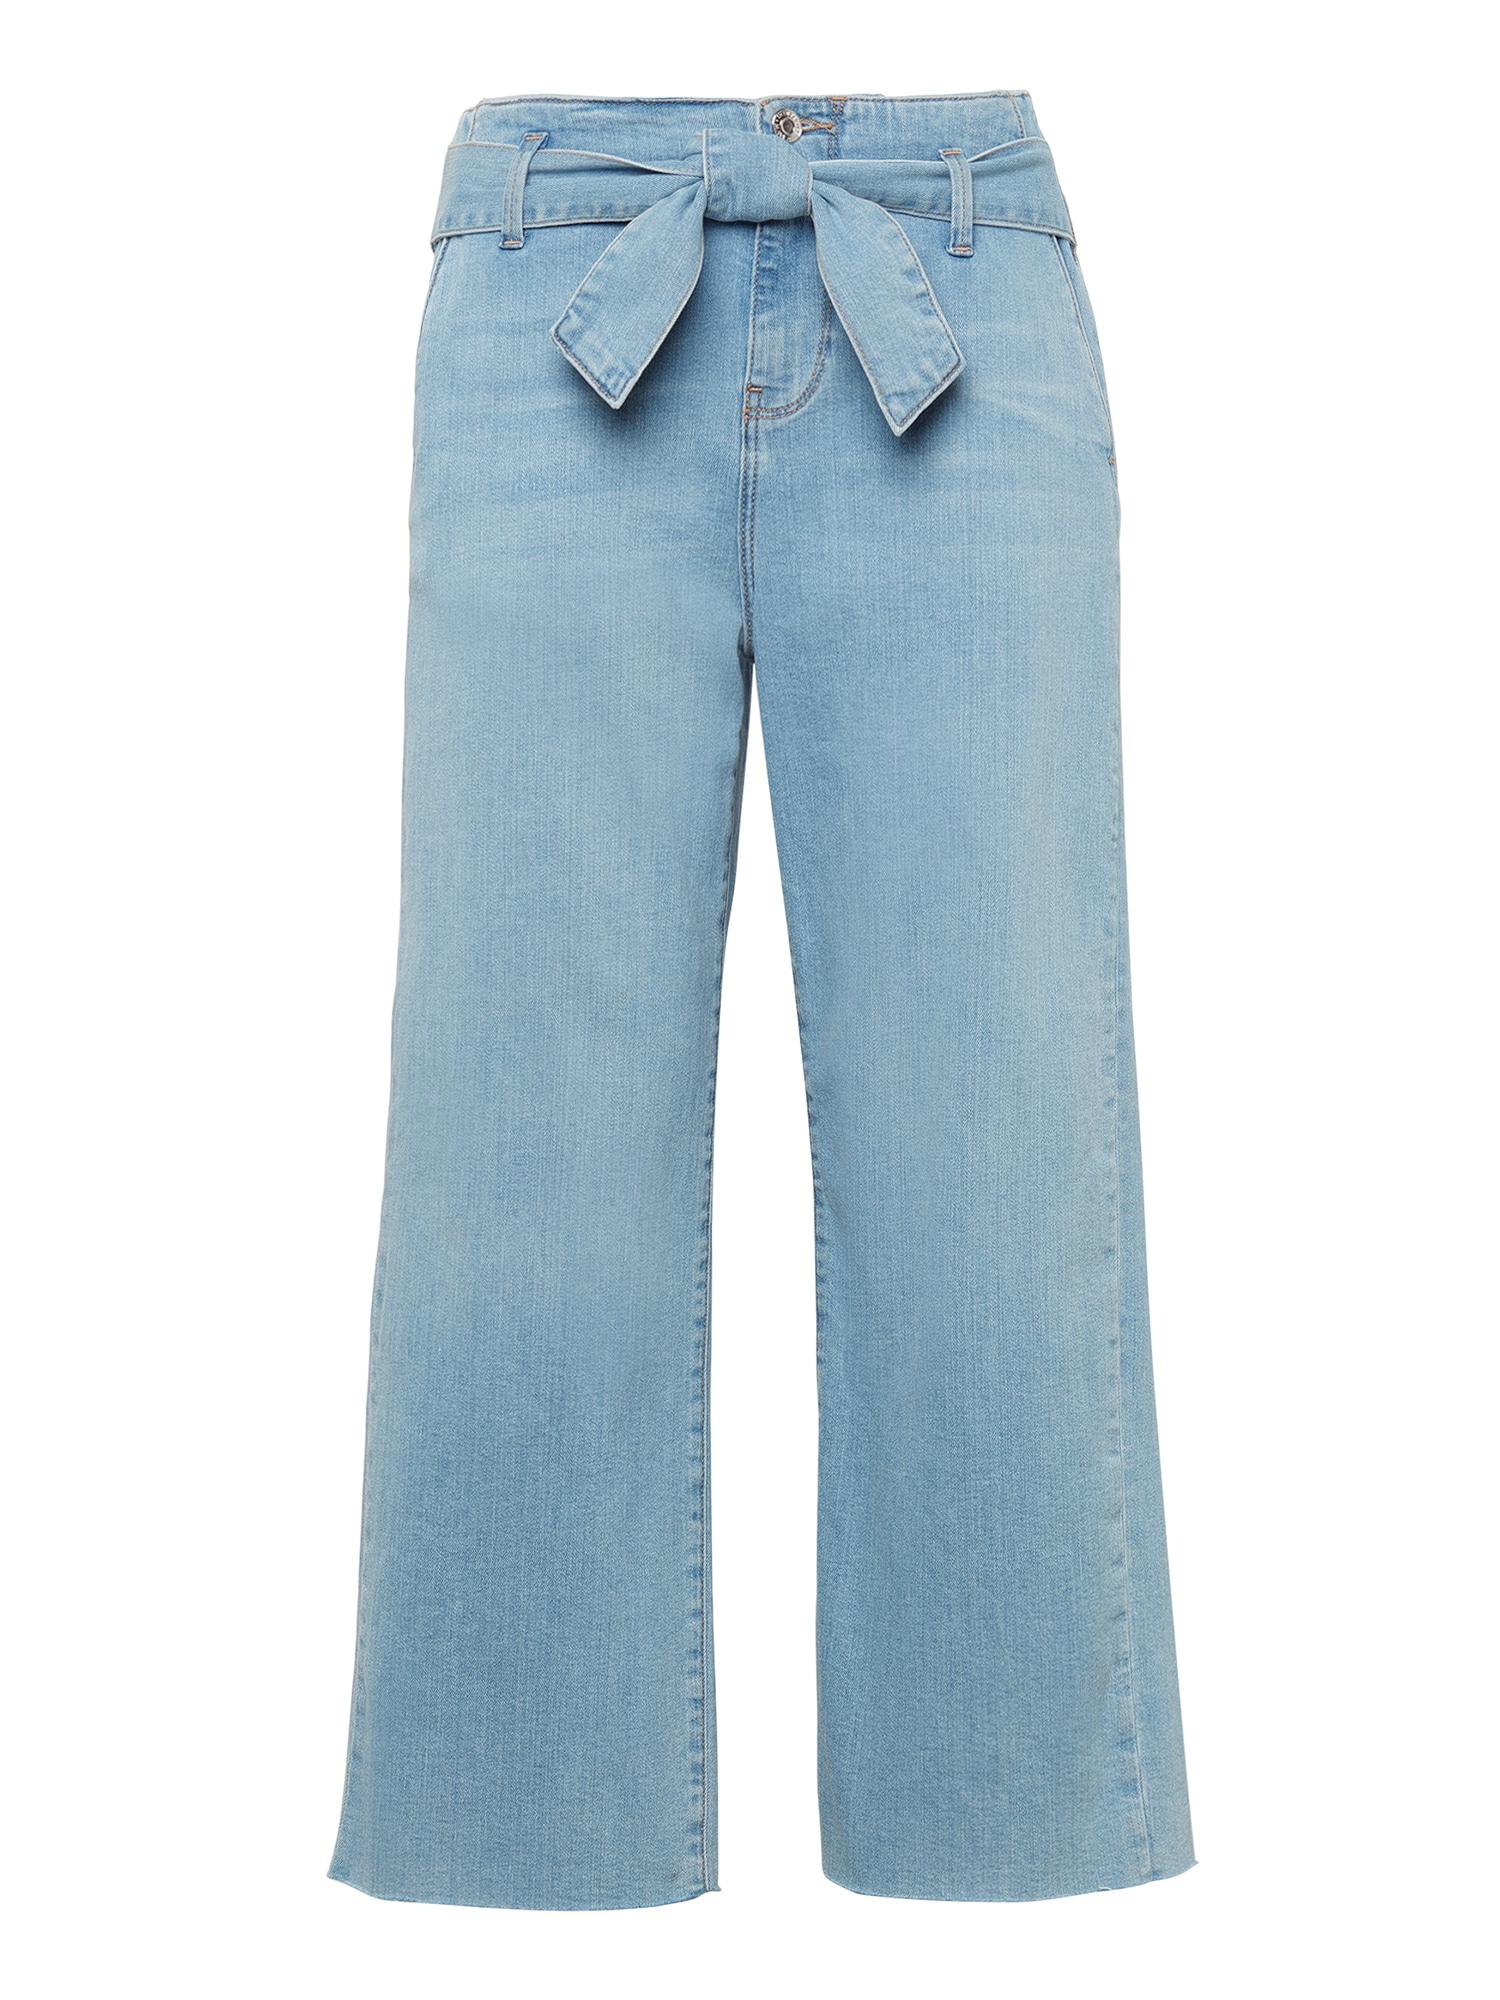 Mavi Džinsai 'Cristin' tamsiai (džinso) mėlyna